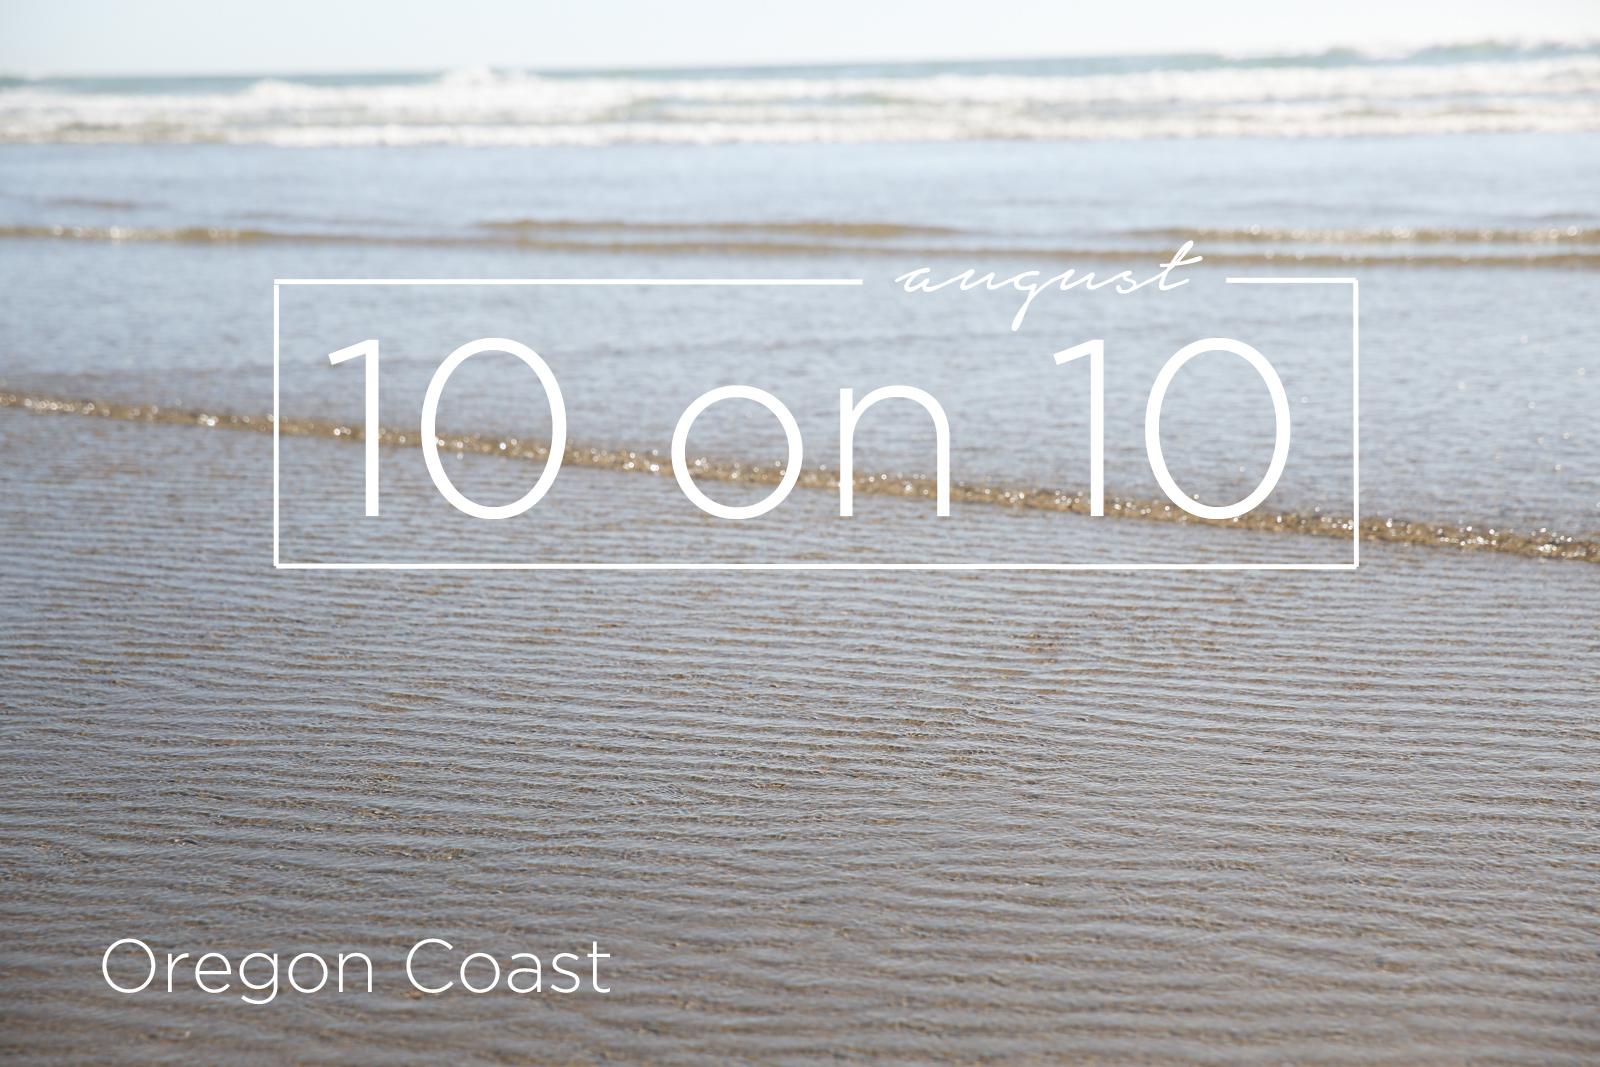 14.08.10_10on10_beach+day-00.jpg